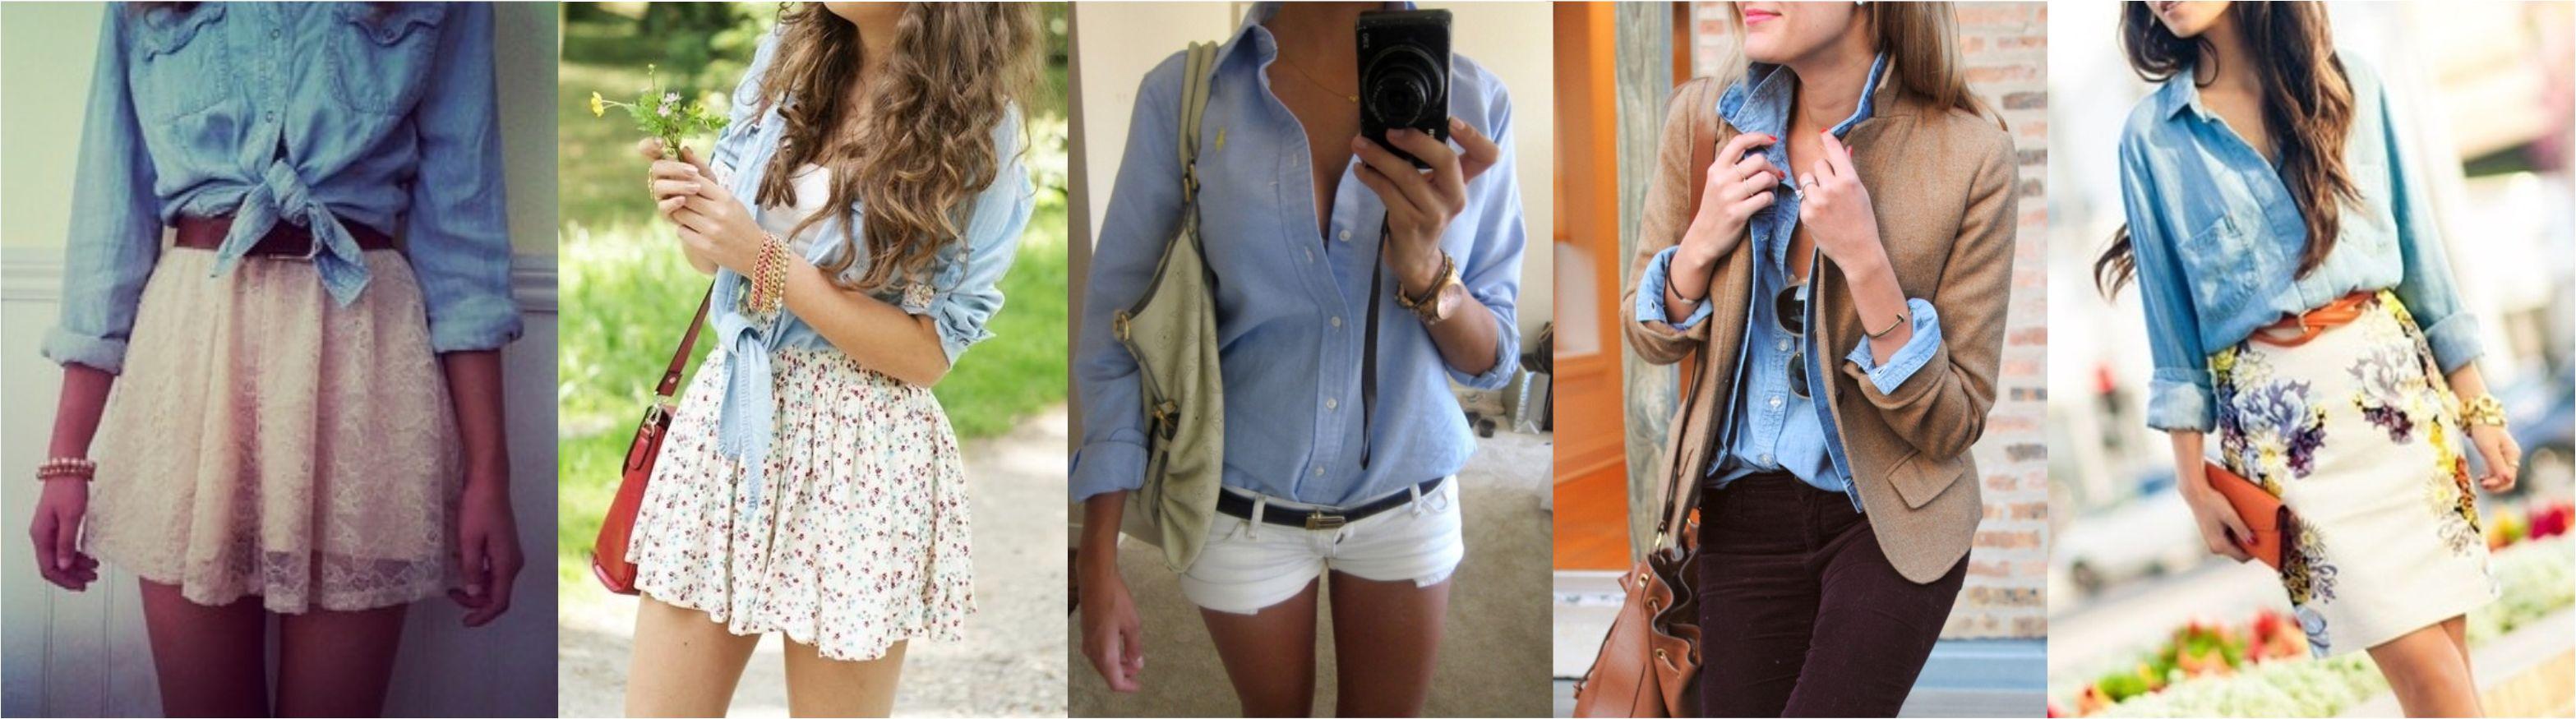 camisa_jeans_sos_solteiro